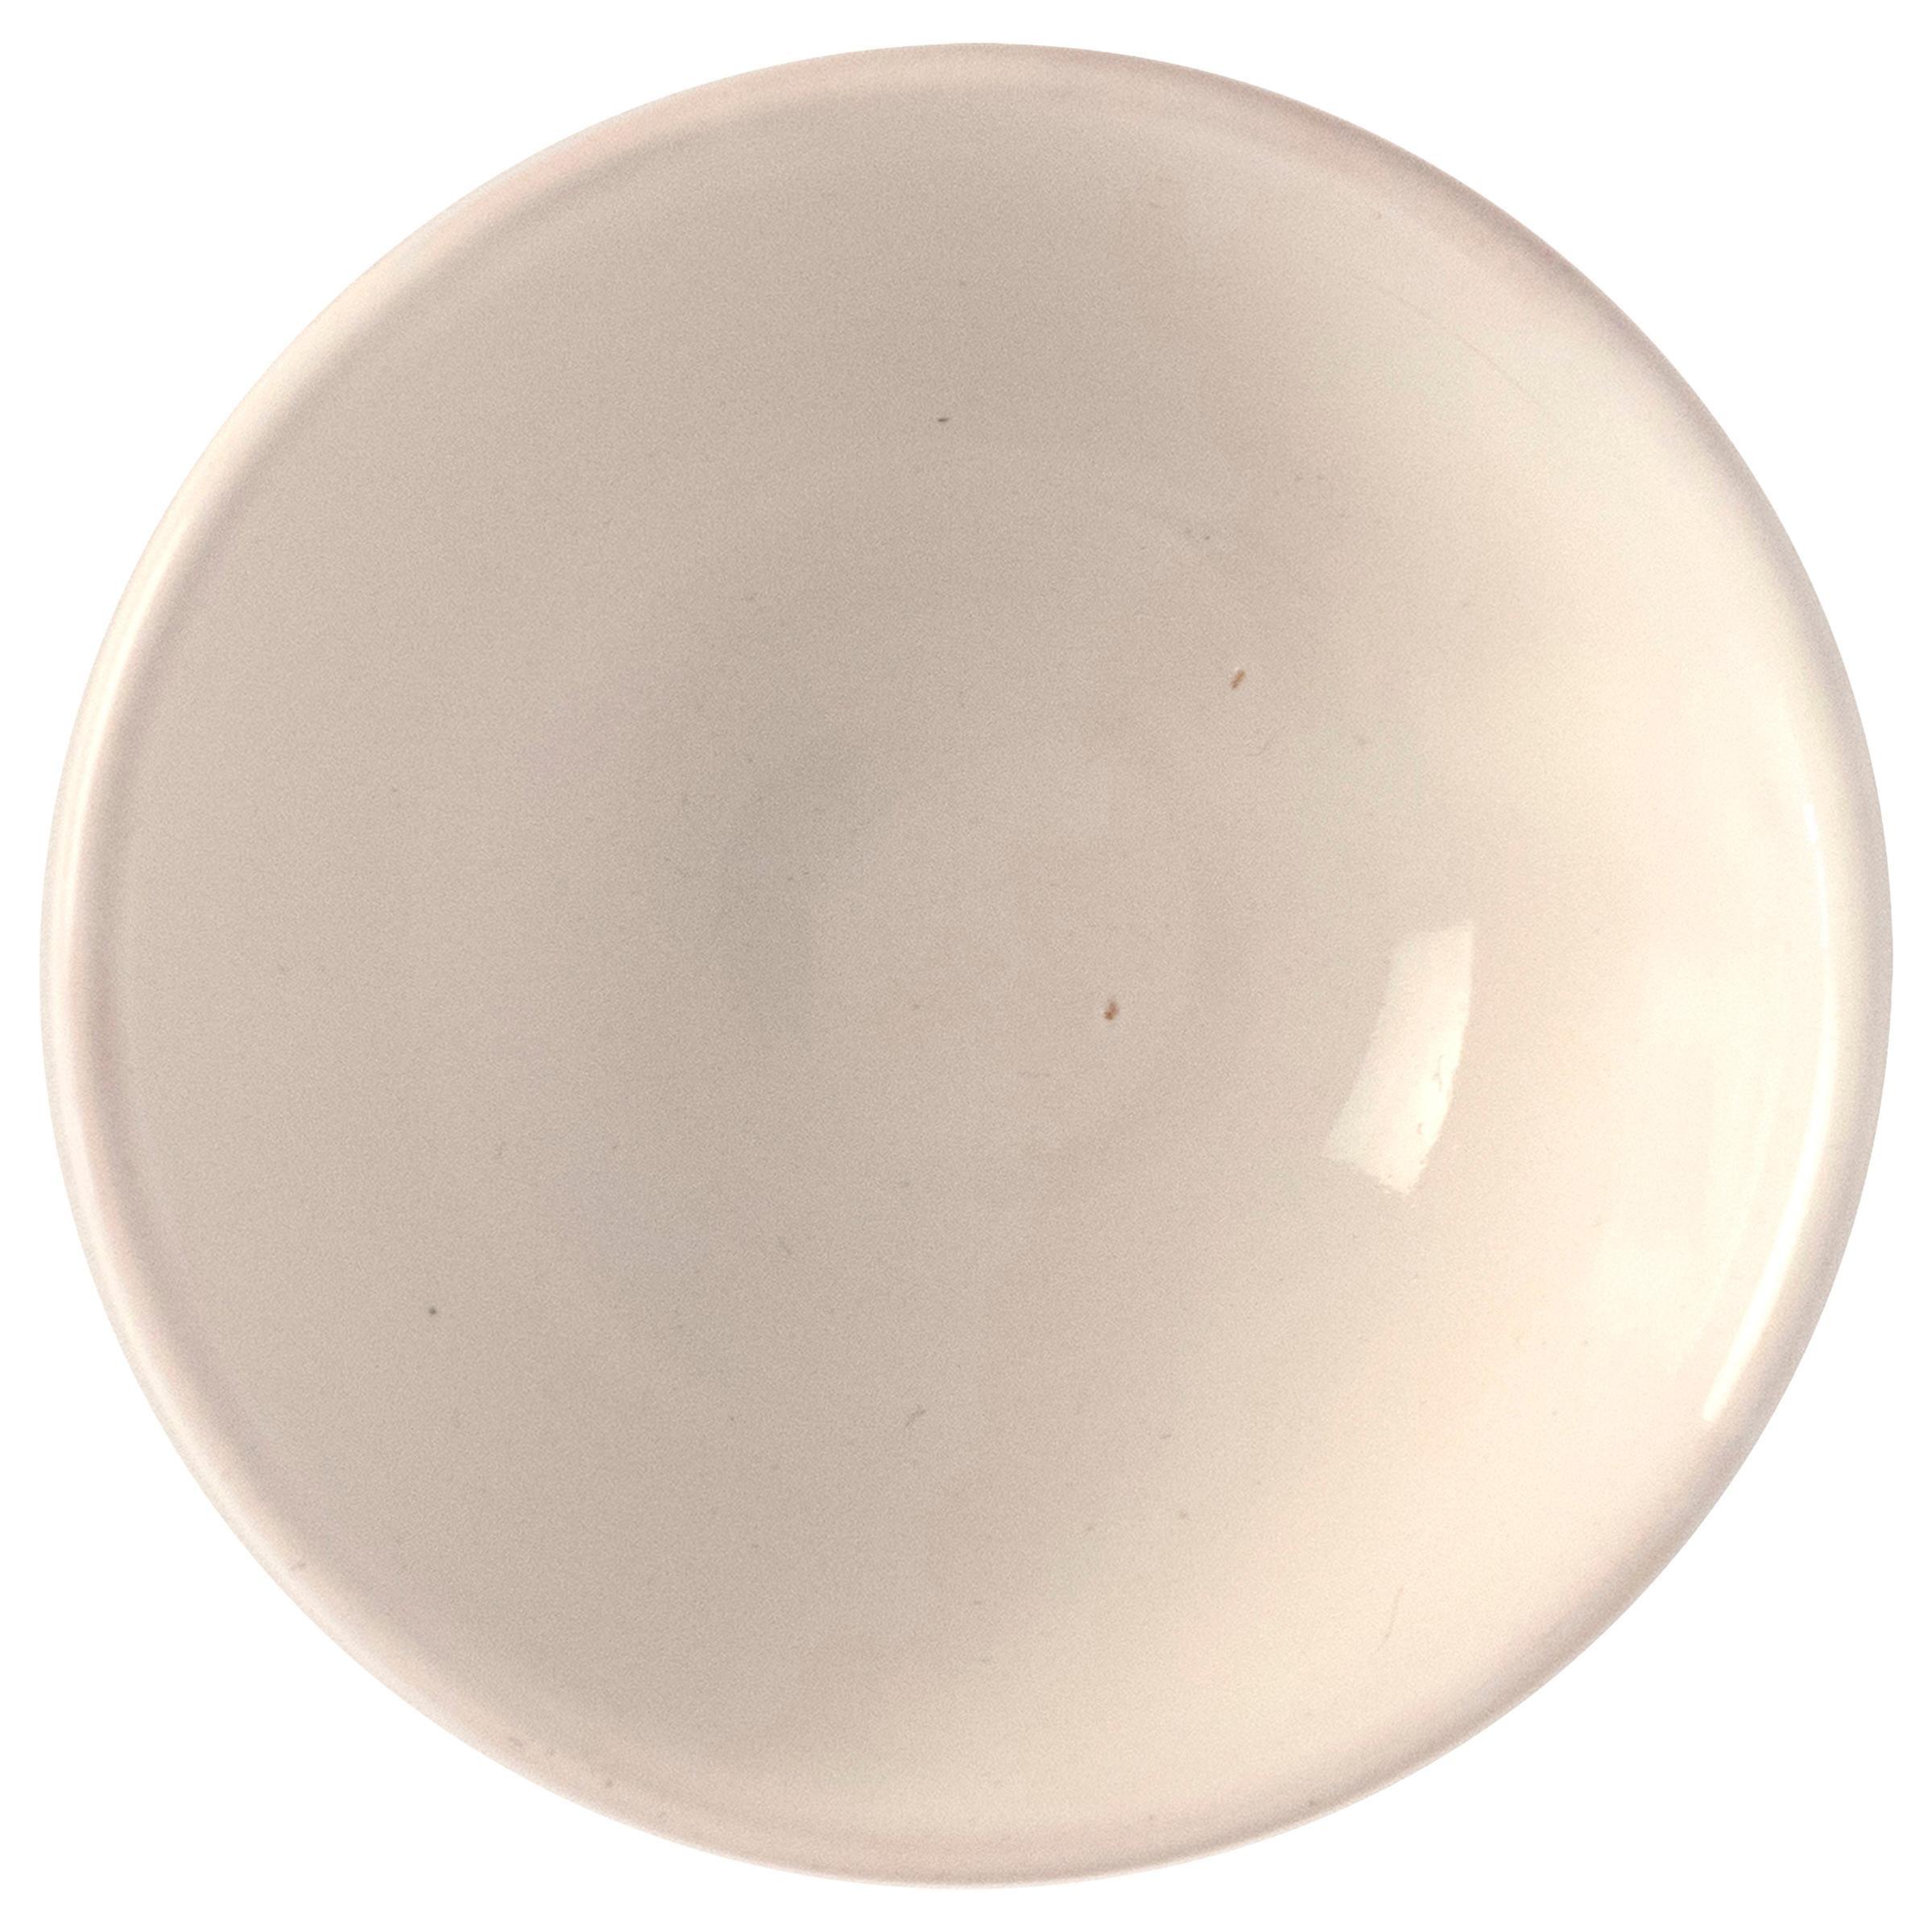 21st Century Large Ceramic Bowl in White Handmade